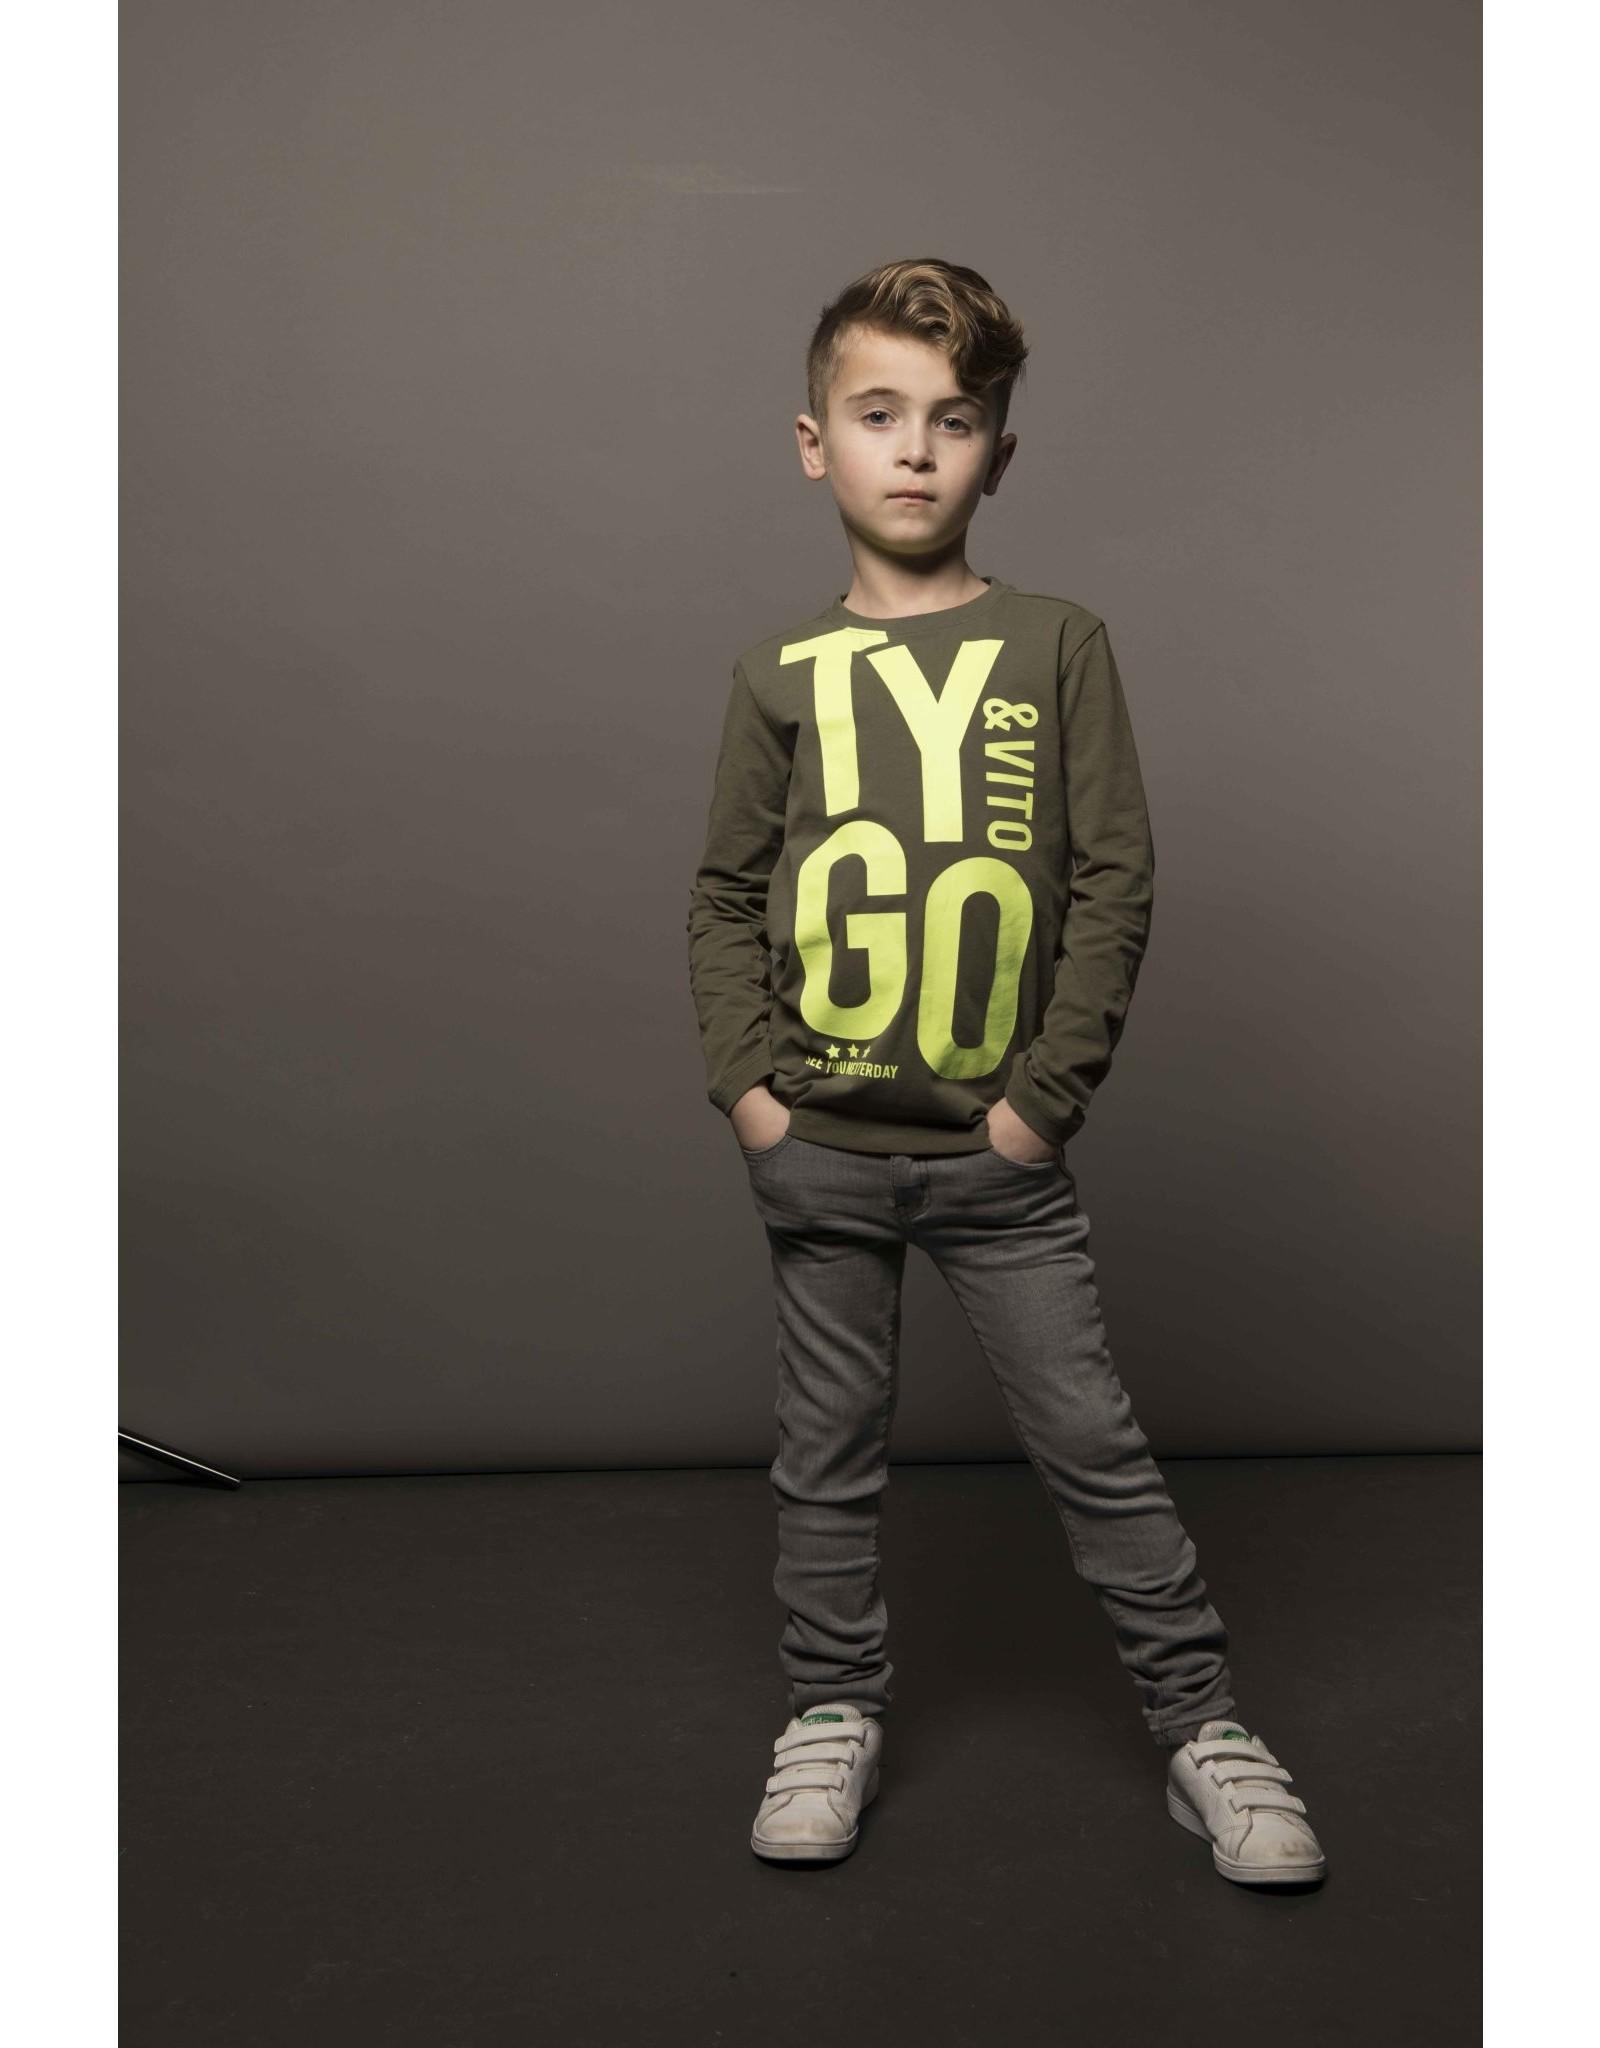 Tygo & vito Jeans skinny, color, extra soft &stretchy 365 D.army